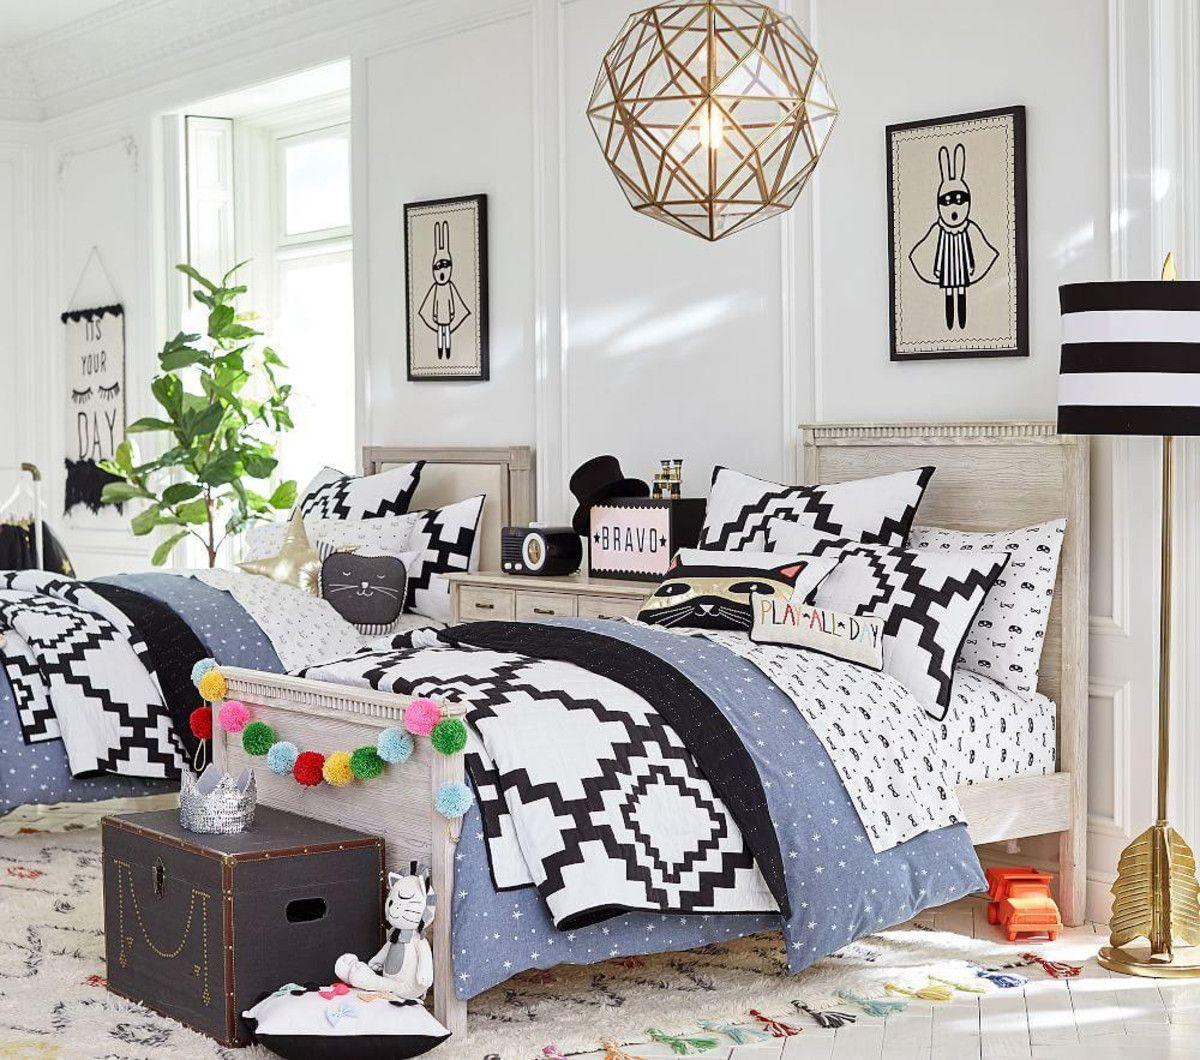 The Emily & Meritt Little Bandit Patchwork Quilted Bedding